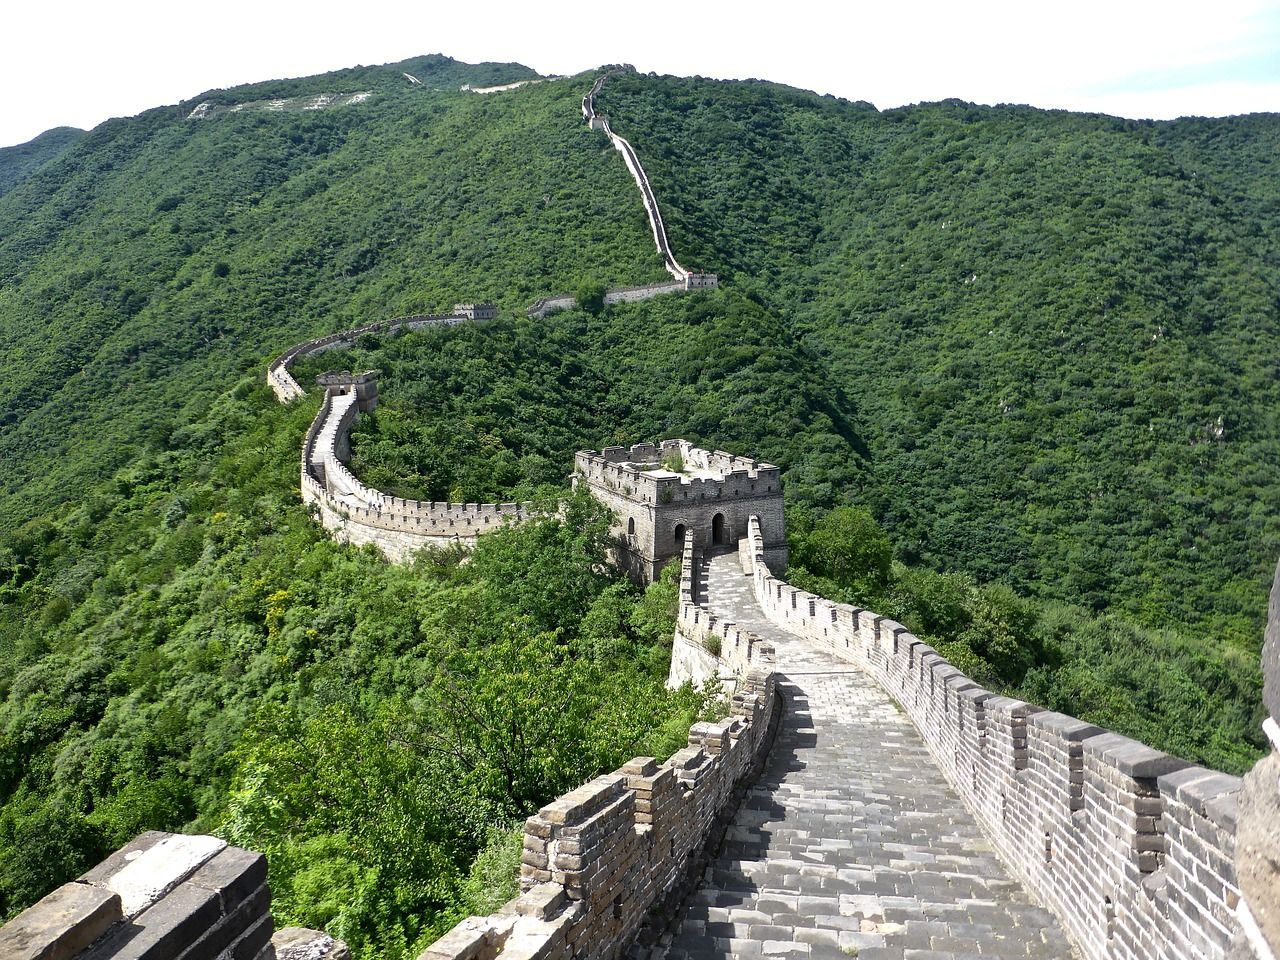 La Gran Muralla China, en China